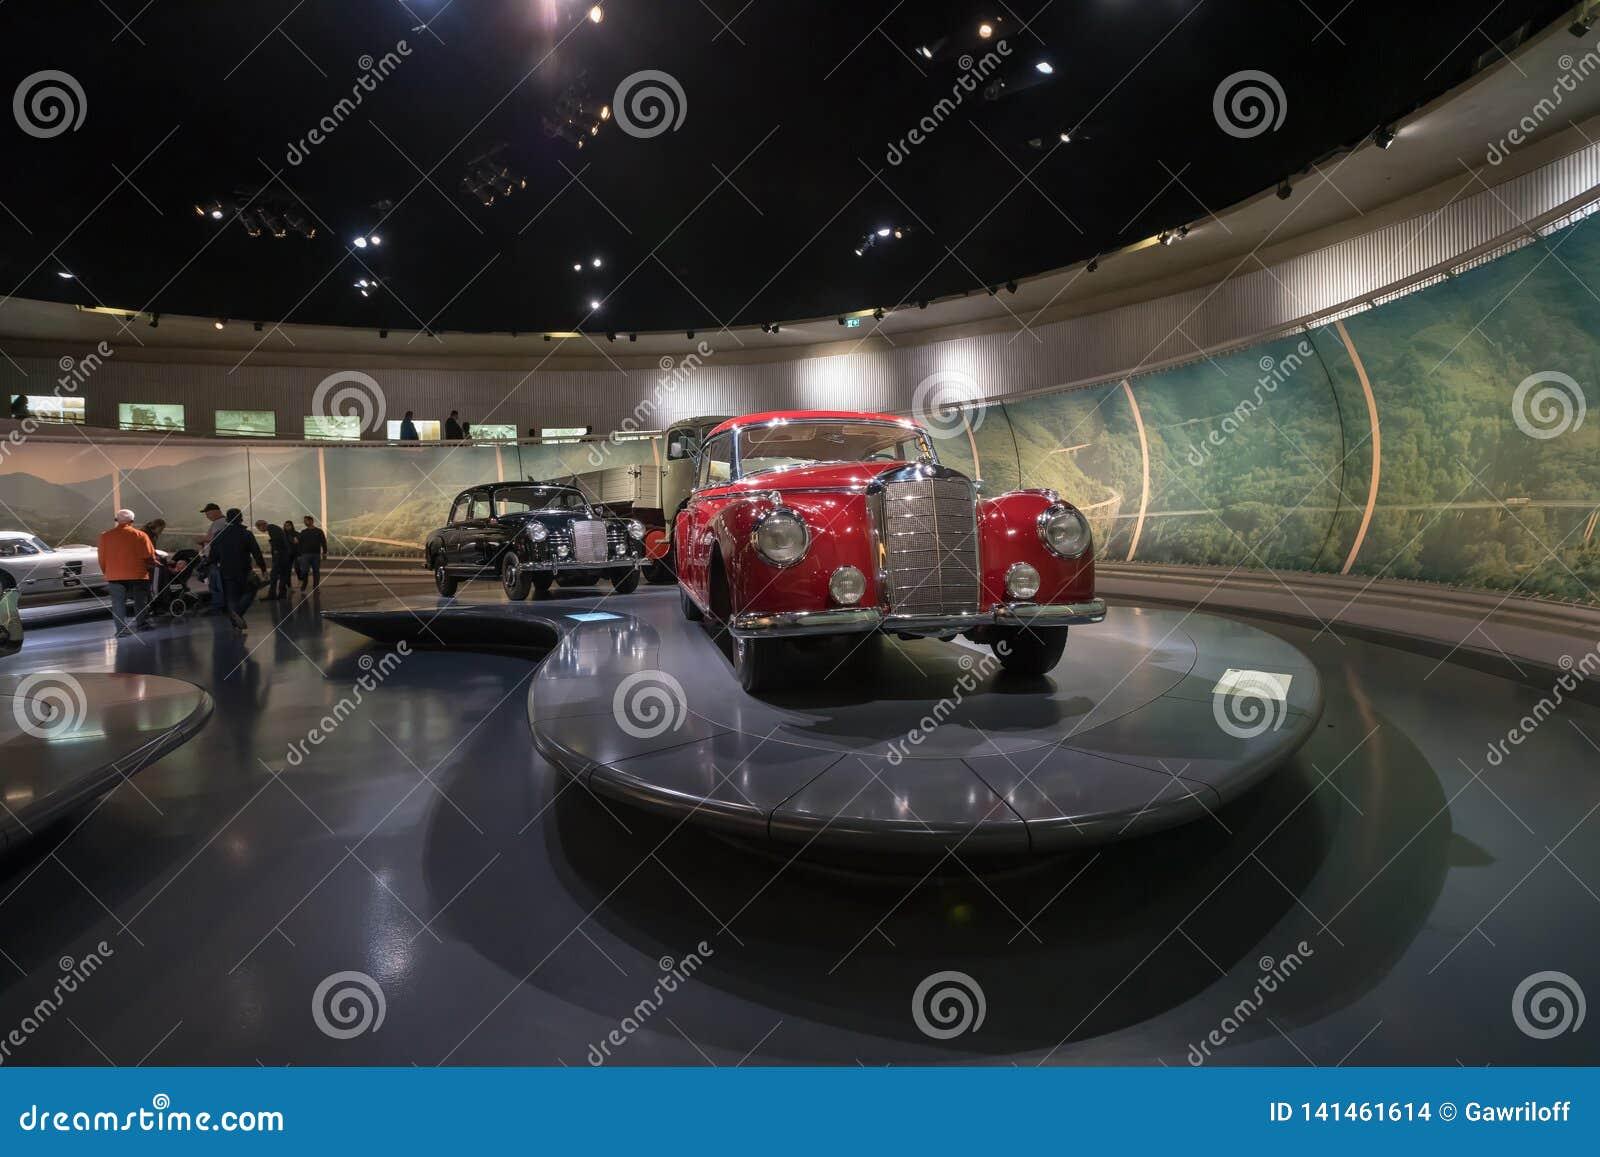 STUTTGART, GERMANY - DECEMBER 30, 2018: Interior of museum